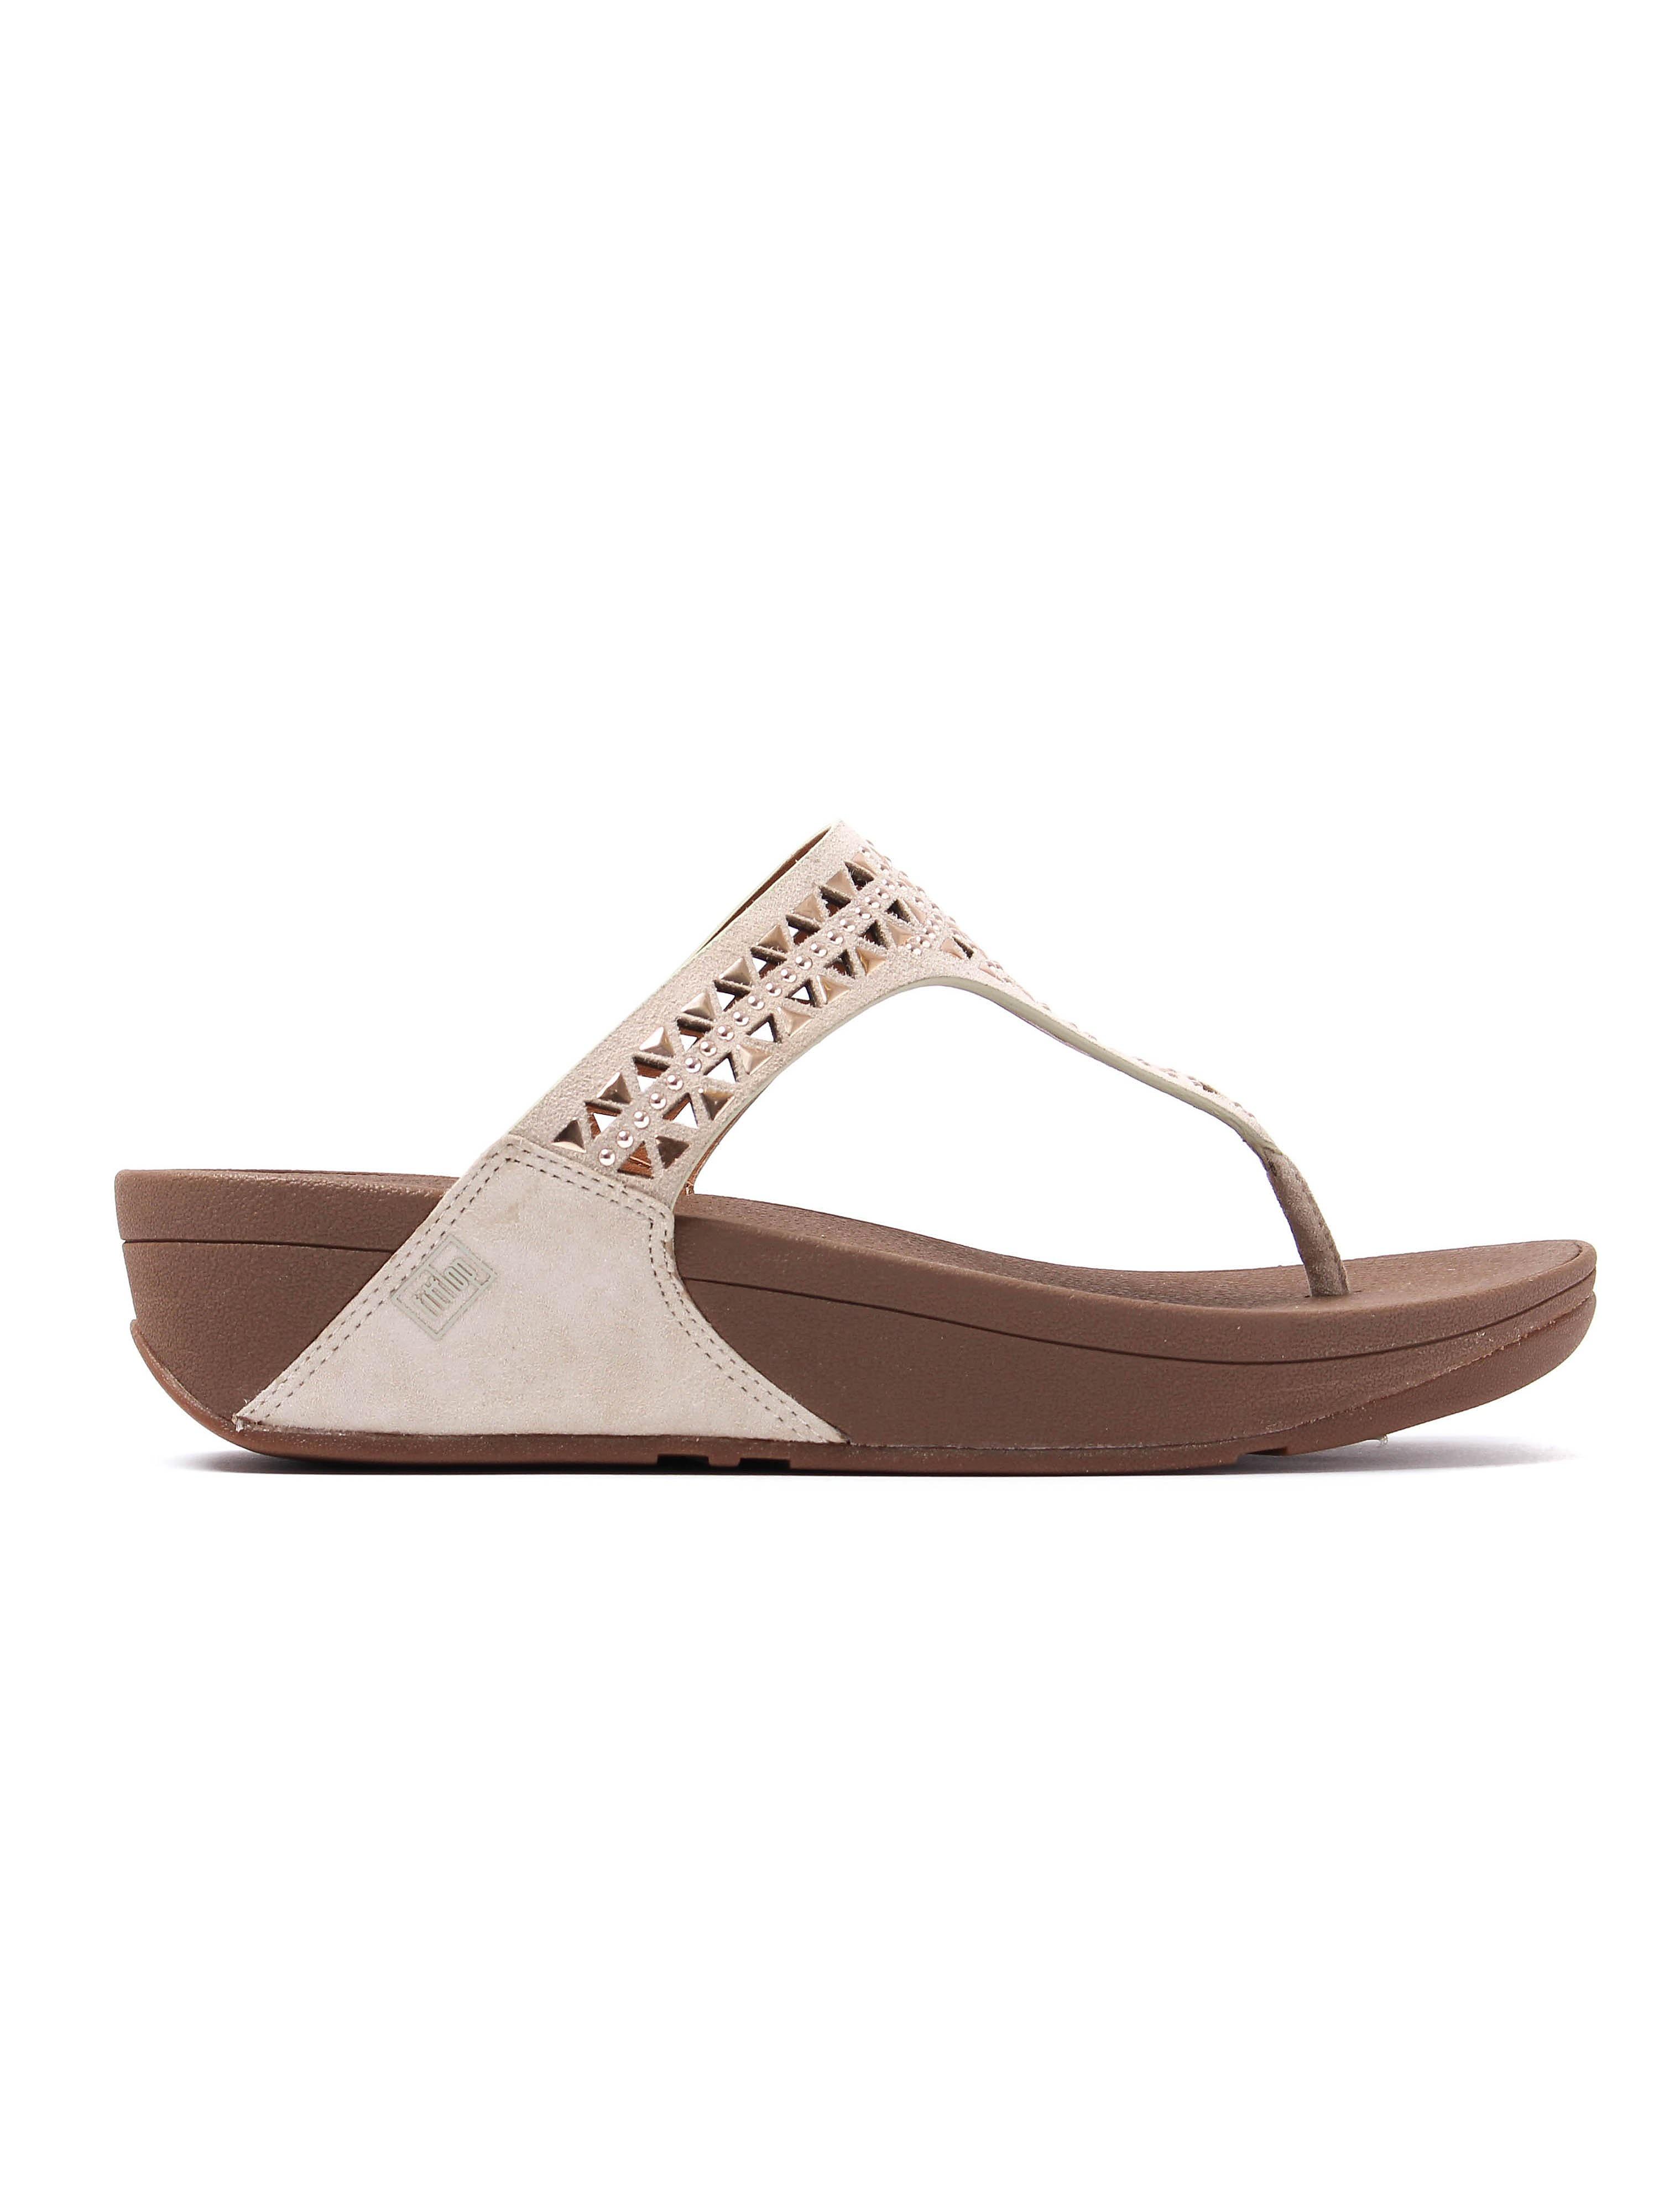 FitFlop  Women's Carmel™ Toe-Post Sandals - Rose Gold